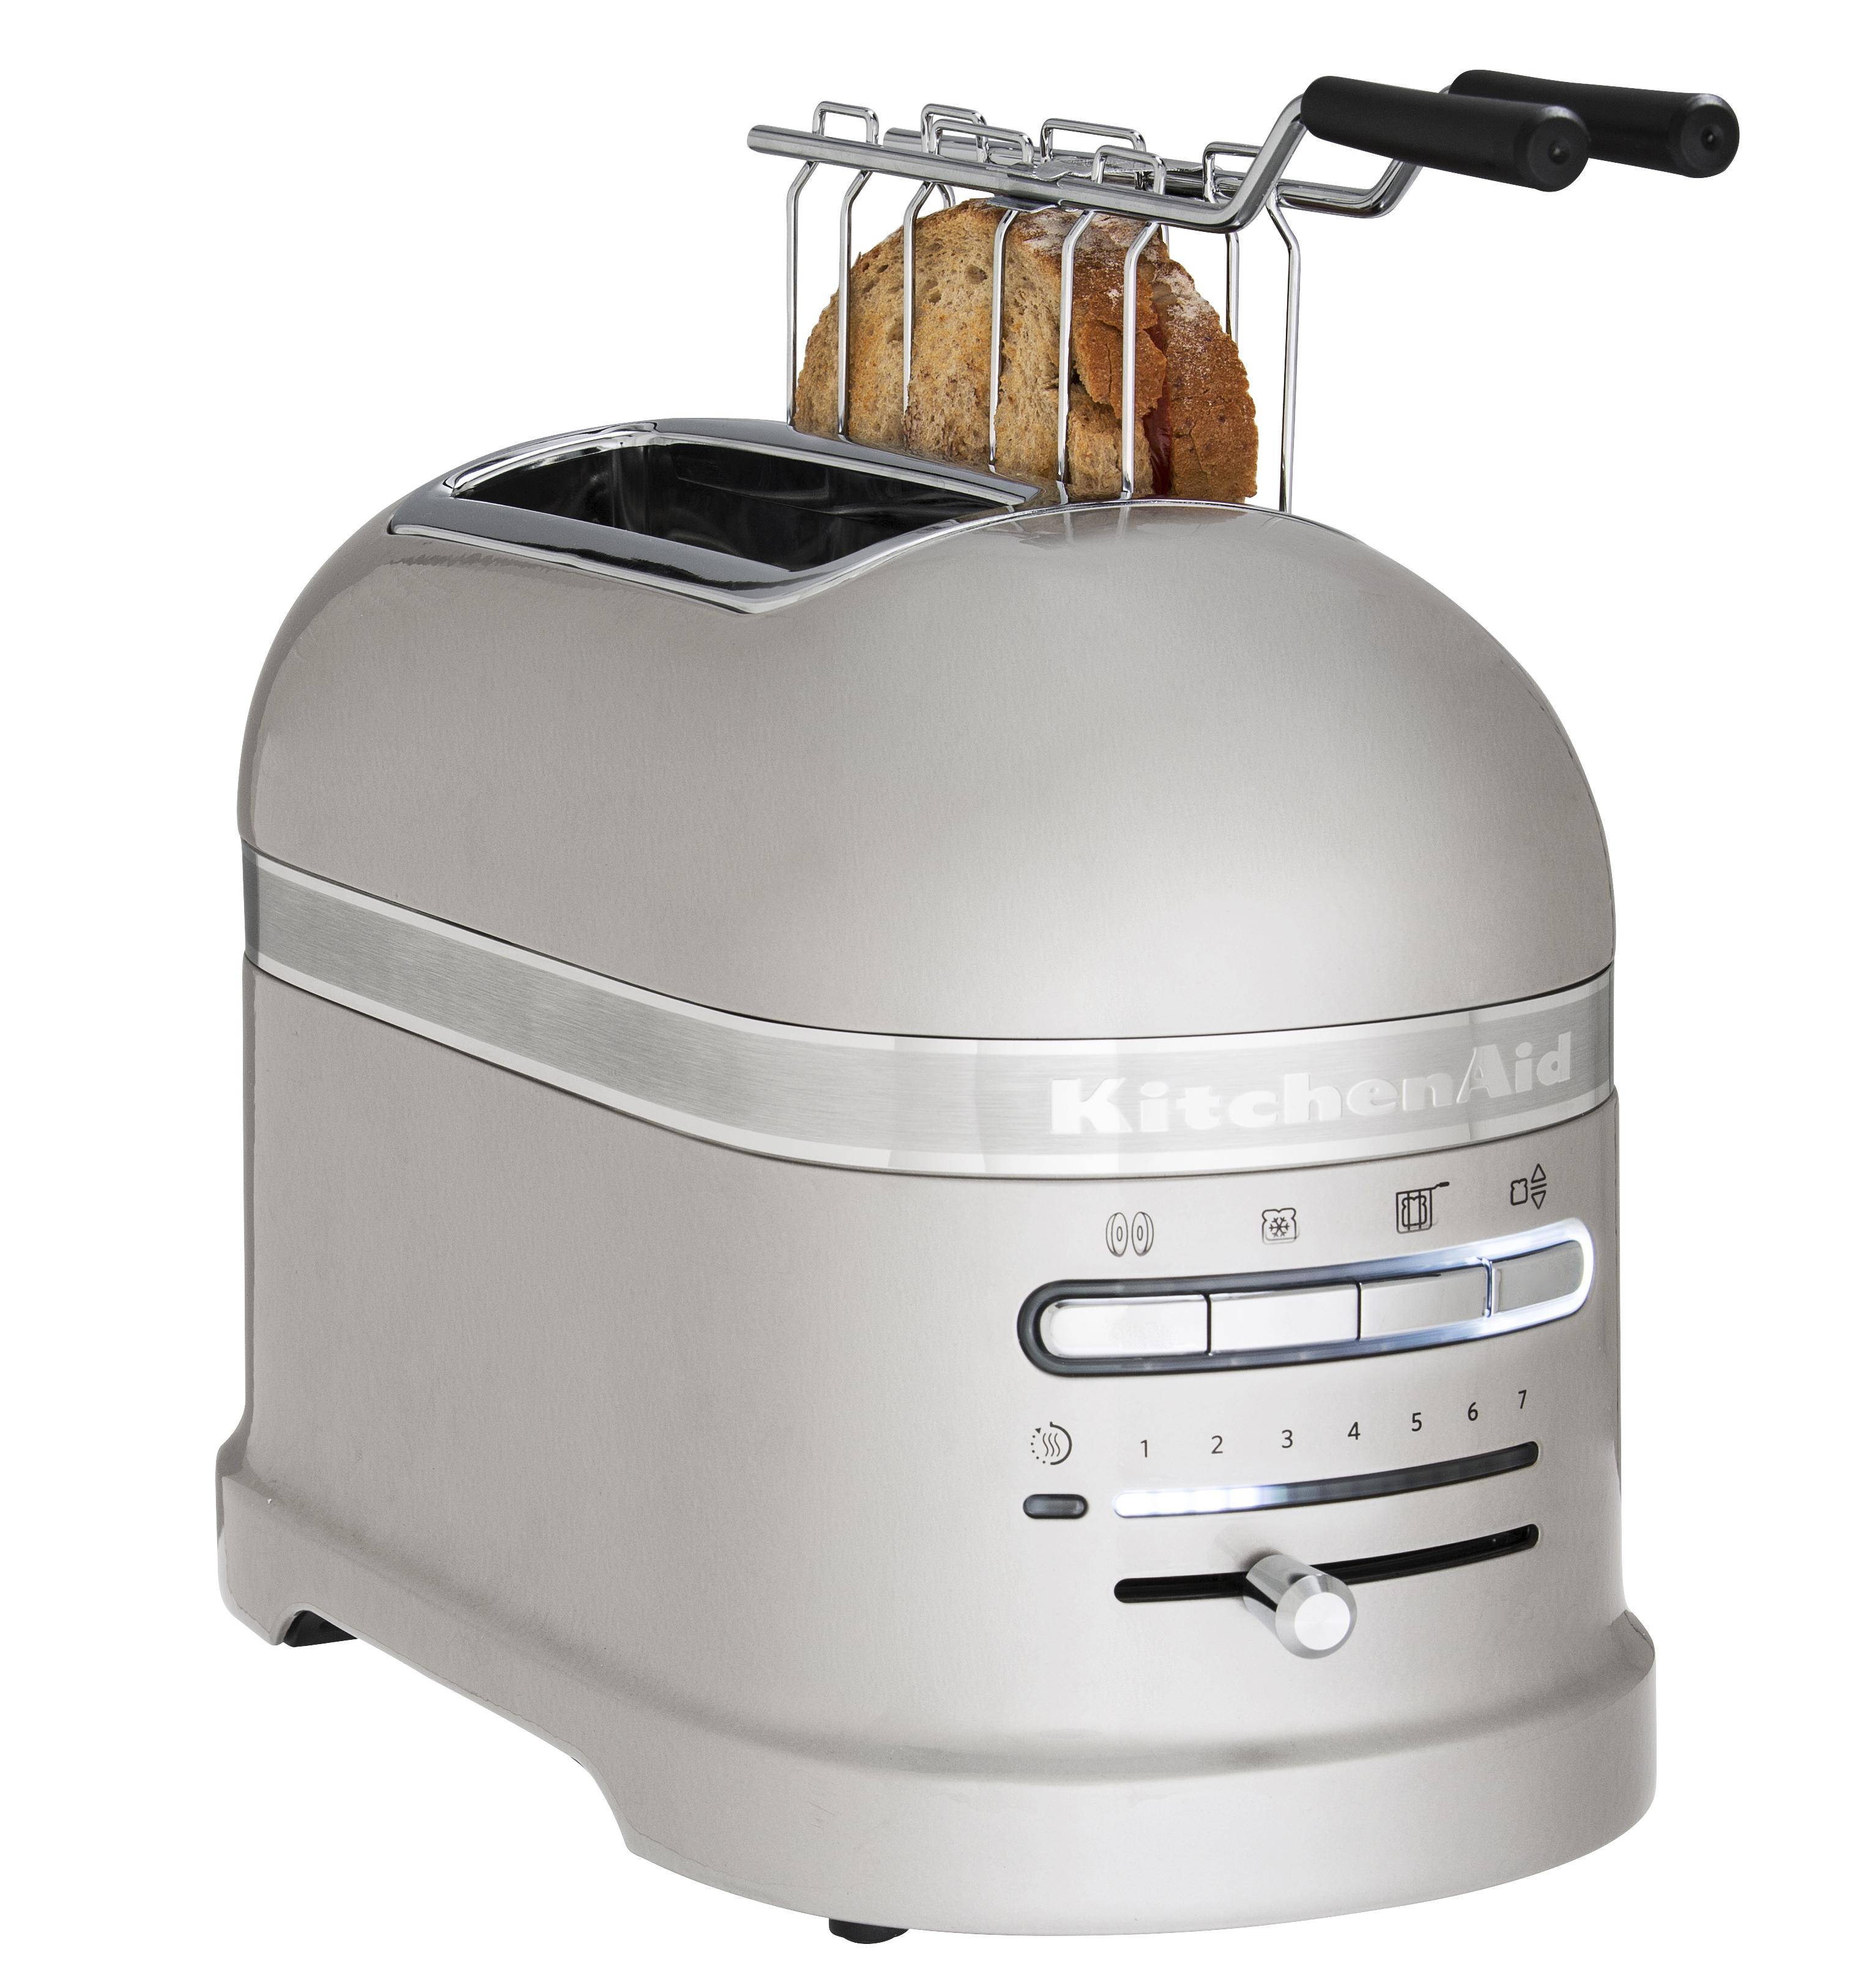 Kitchenaid Pro Line Kmt2204 2 Slice Automatic Toaster